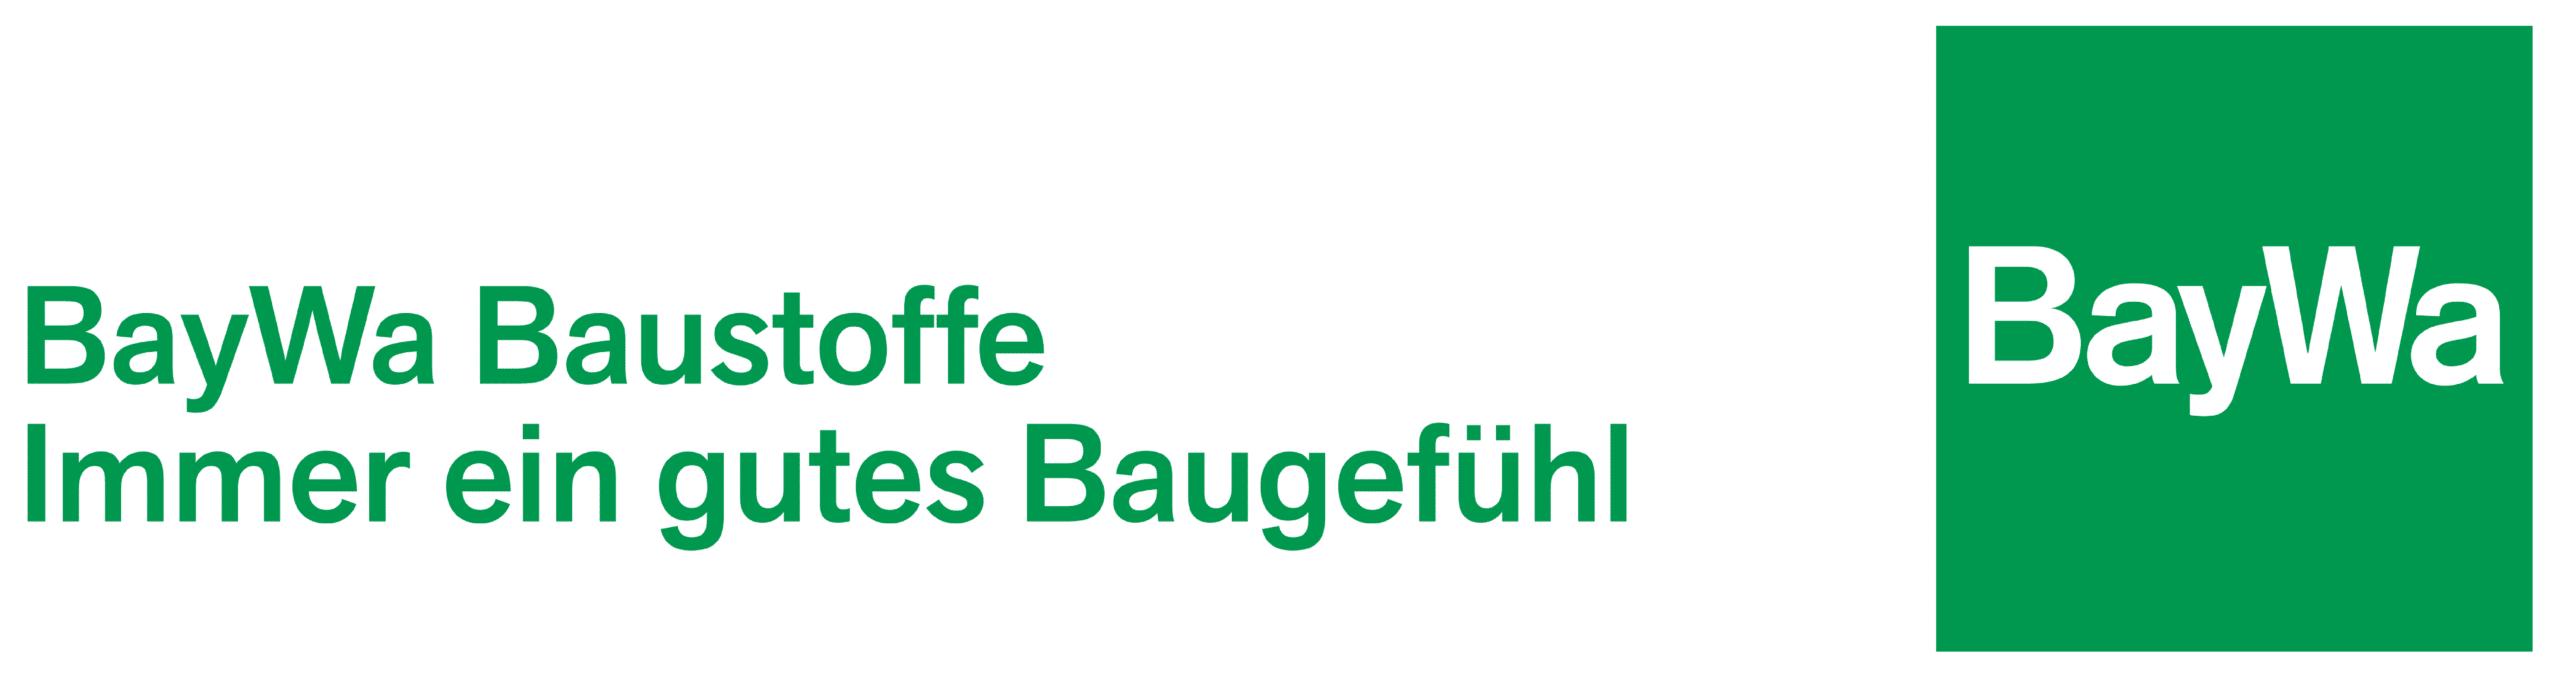 BayWa Baustoffe_Web